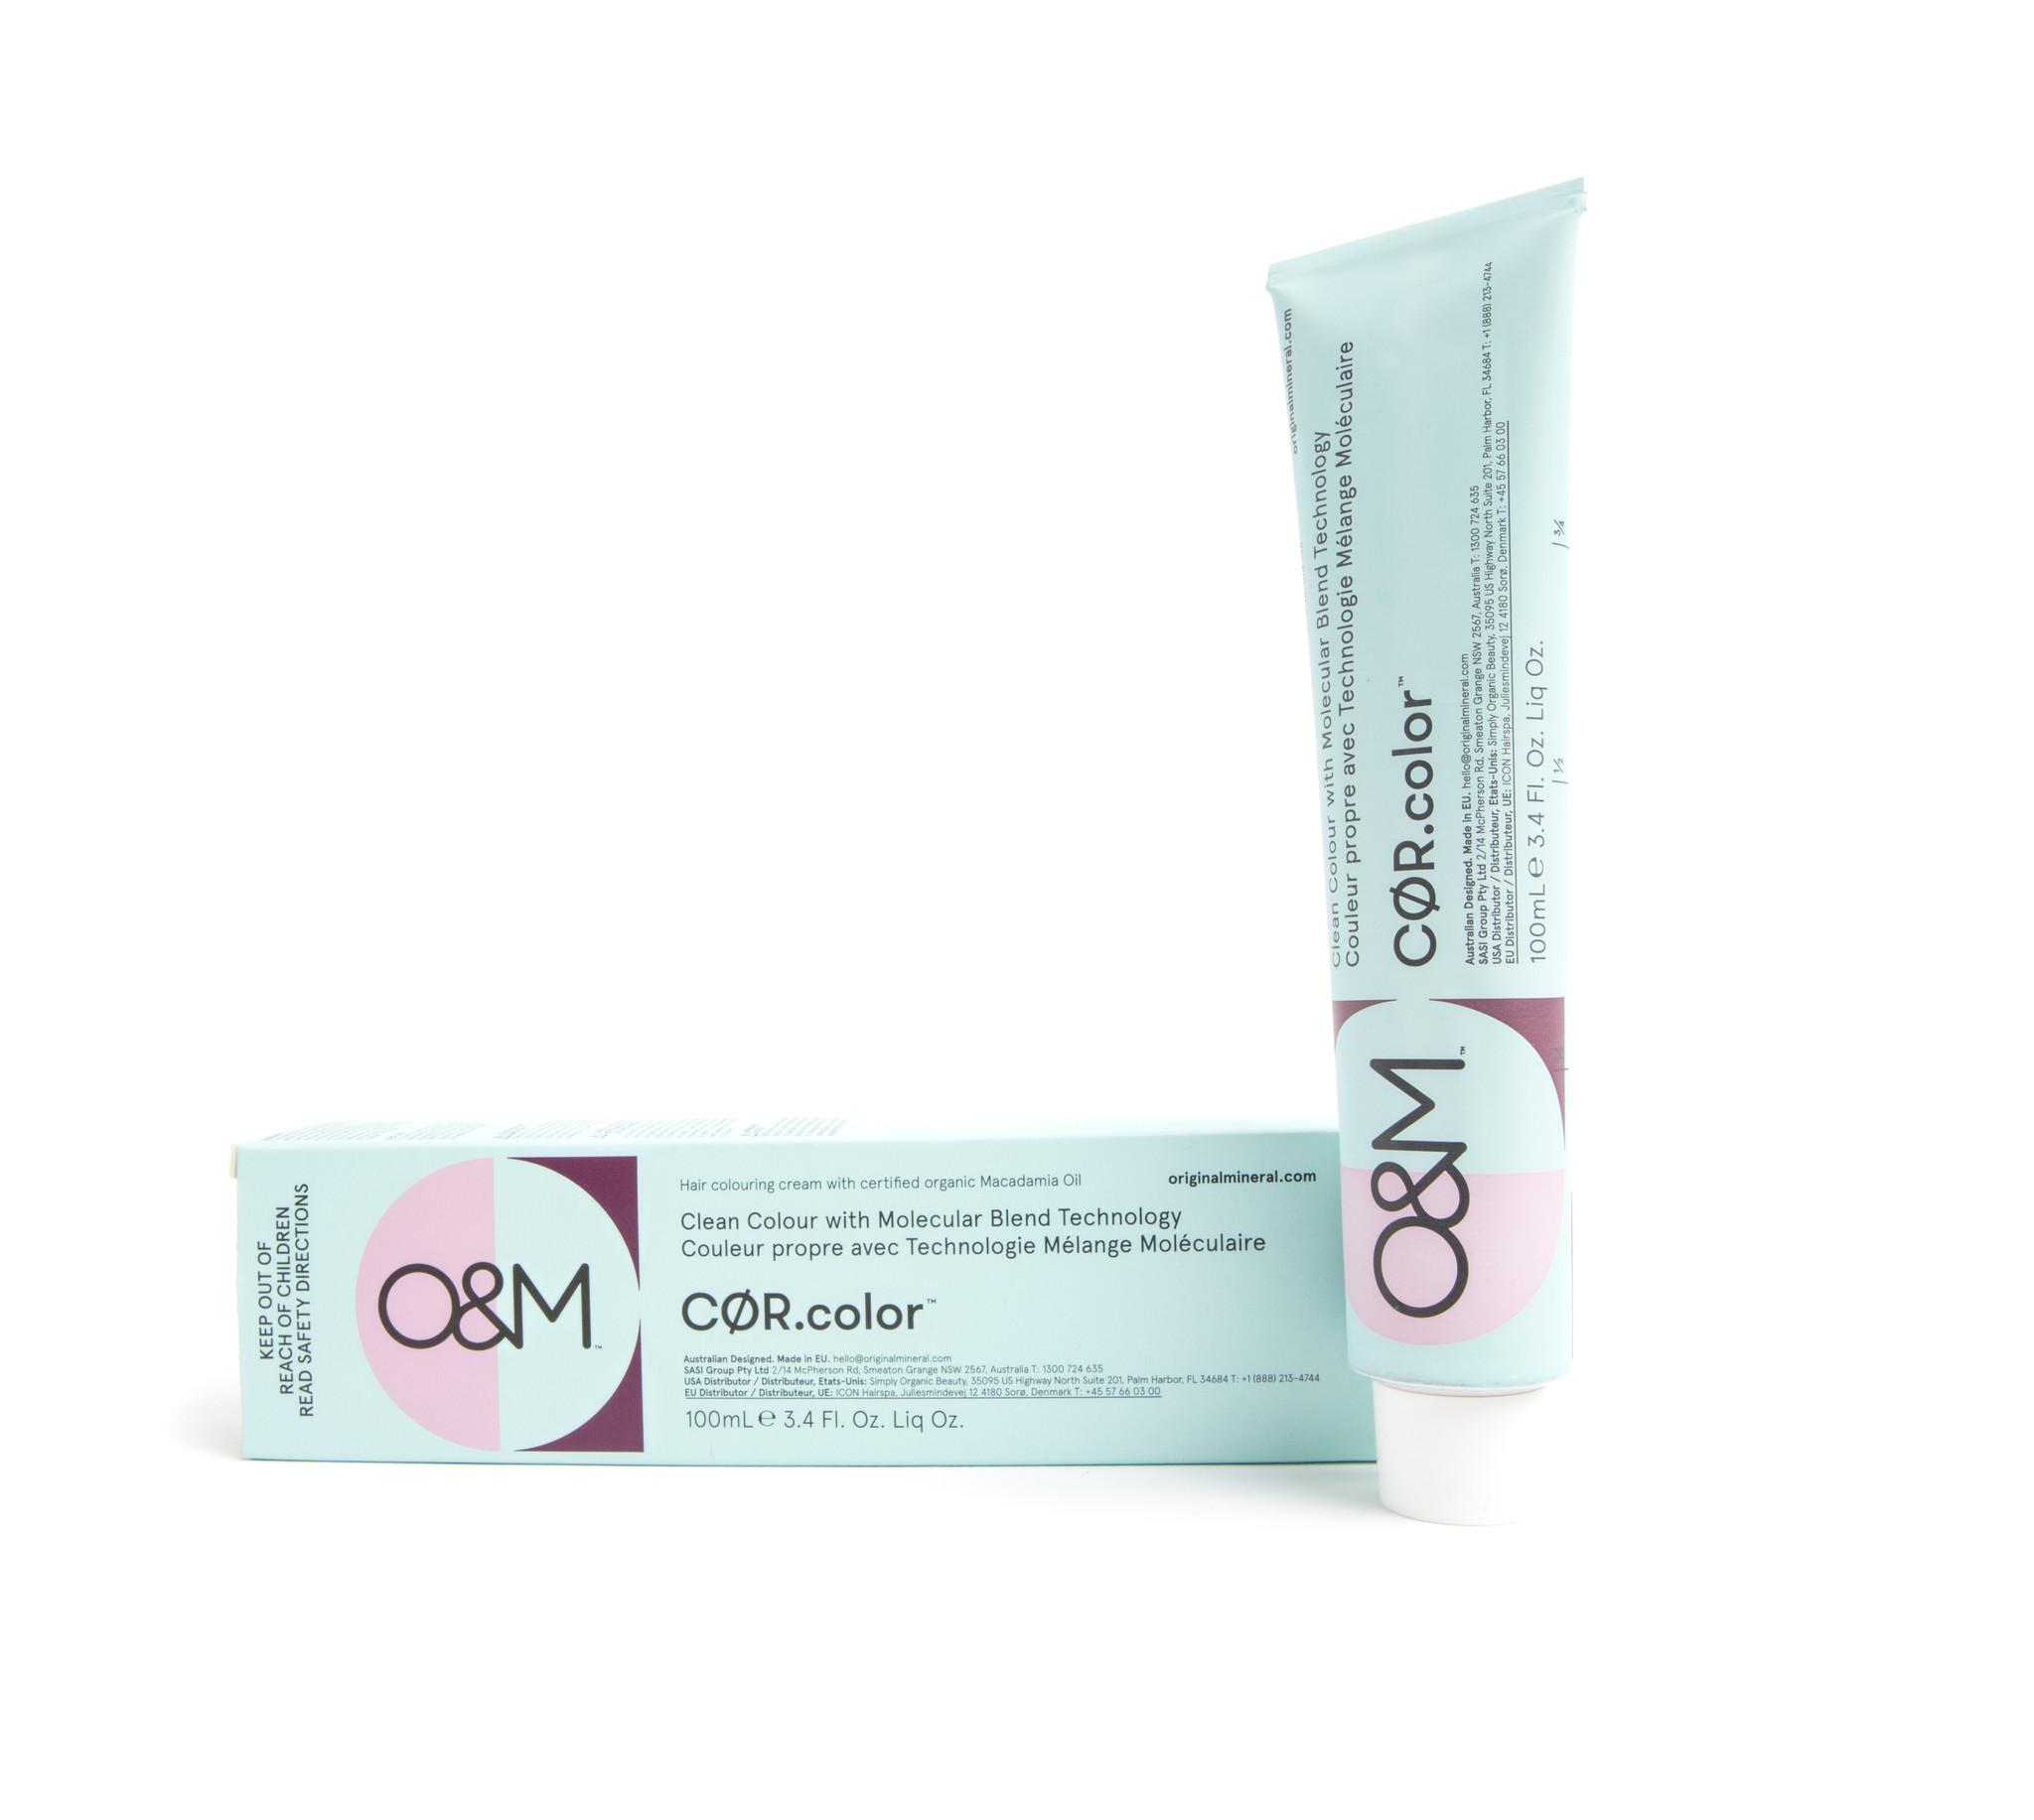 O&M - Original Mineral O&M CØR.color Very Light Ash Violet Blonde 9.16 100g